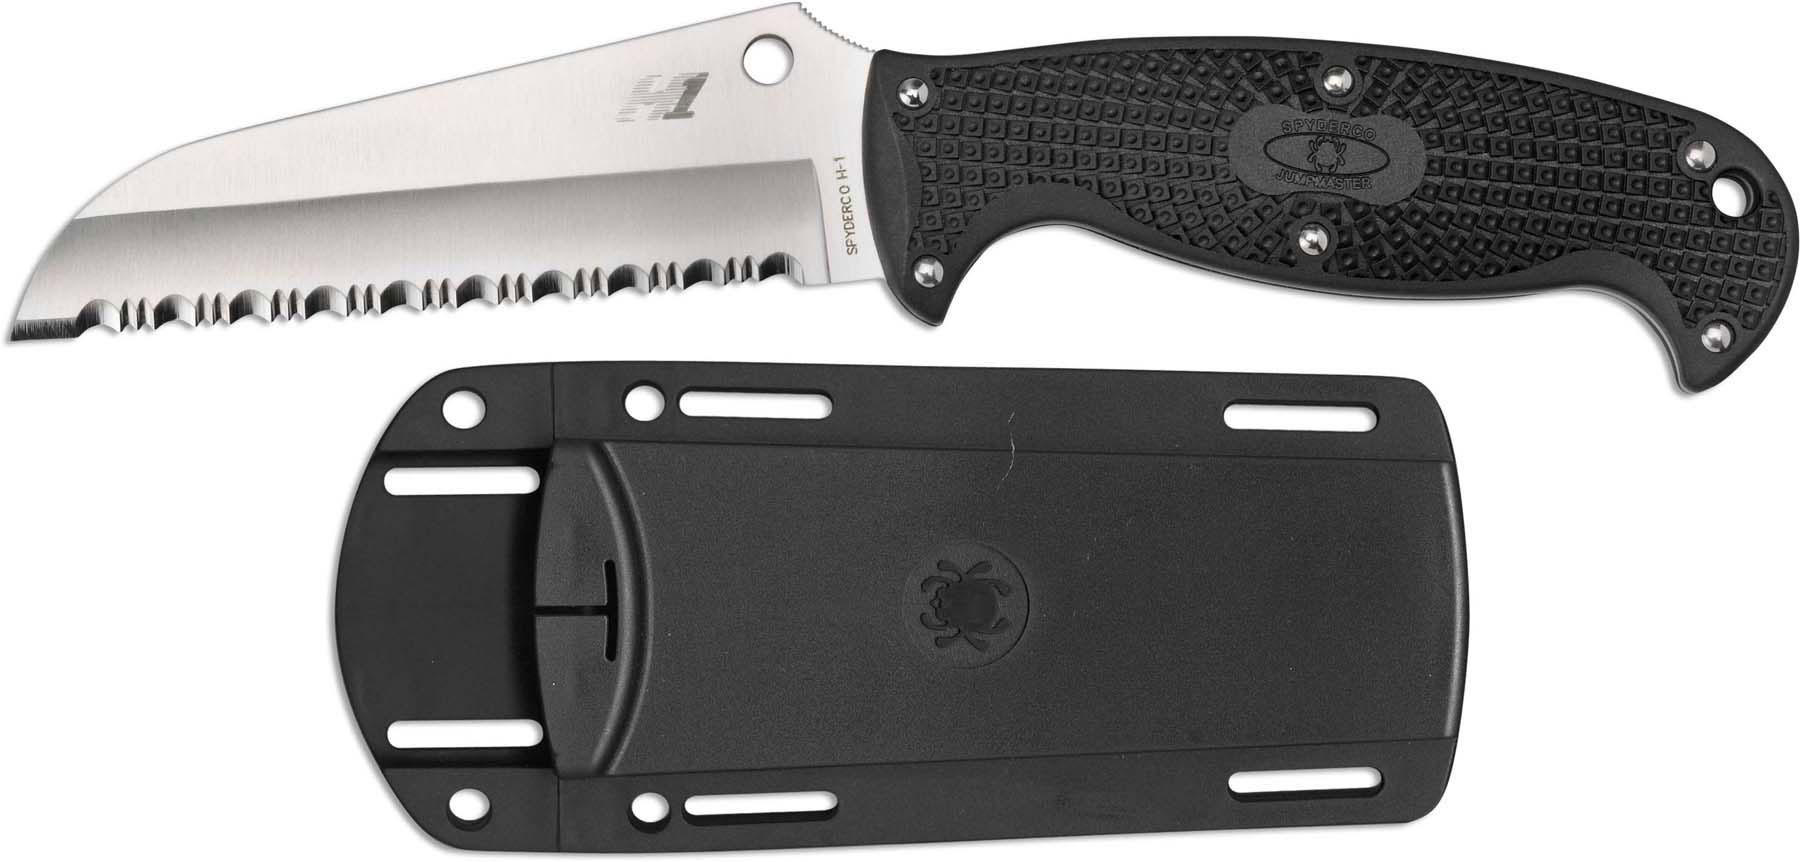 Spyderco Knives Spyderco Jumpmaster Knife Sp Fb24sbk